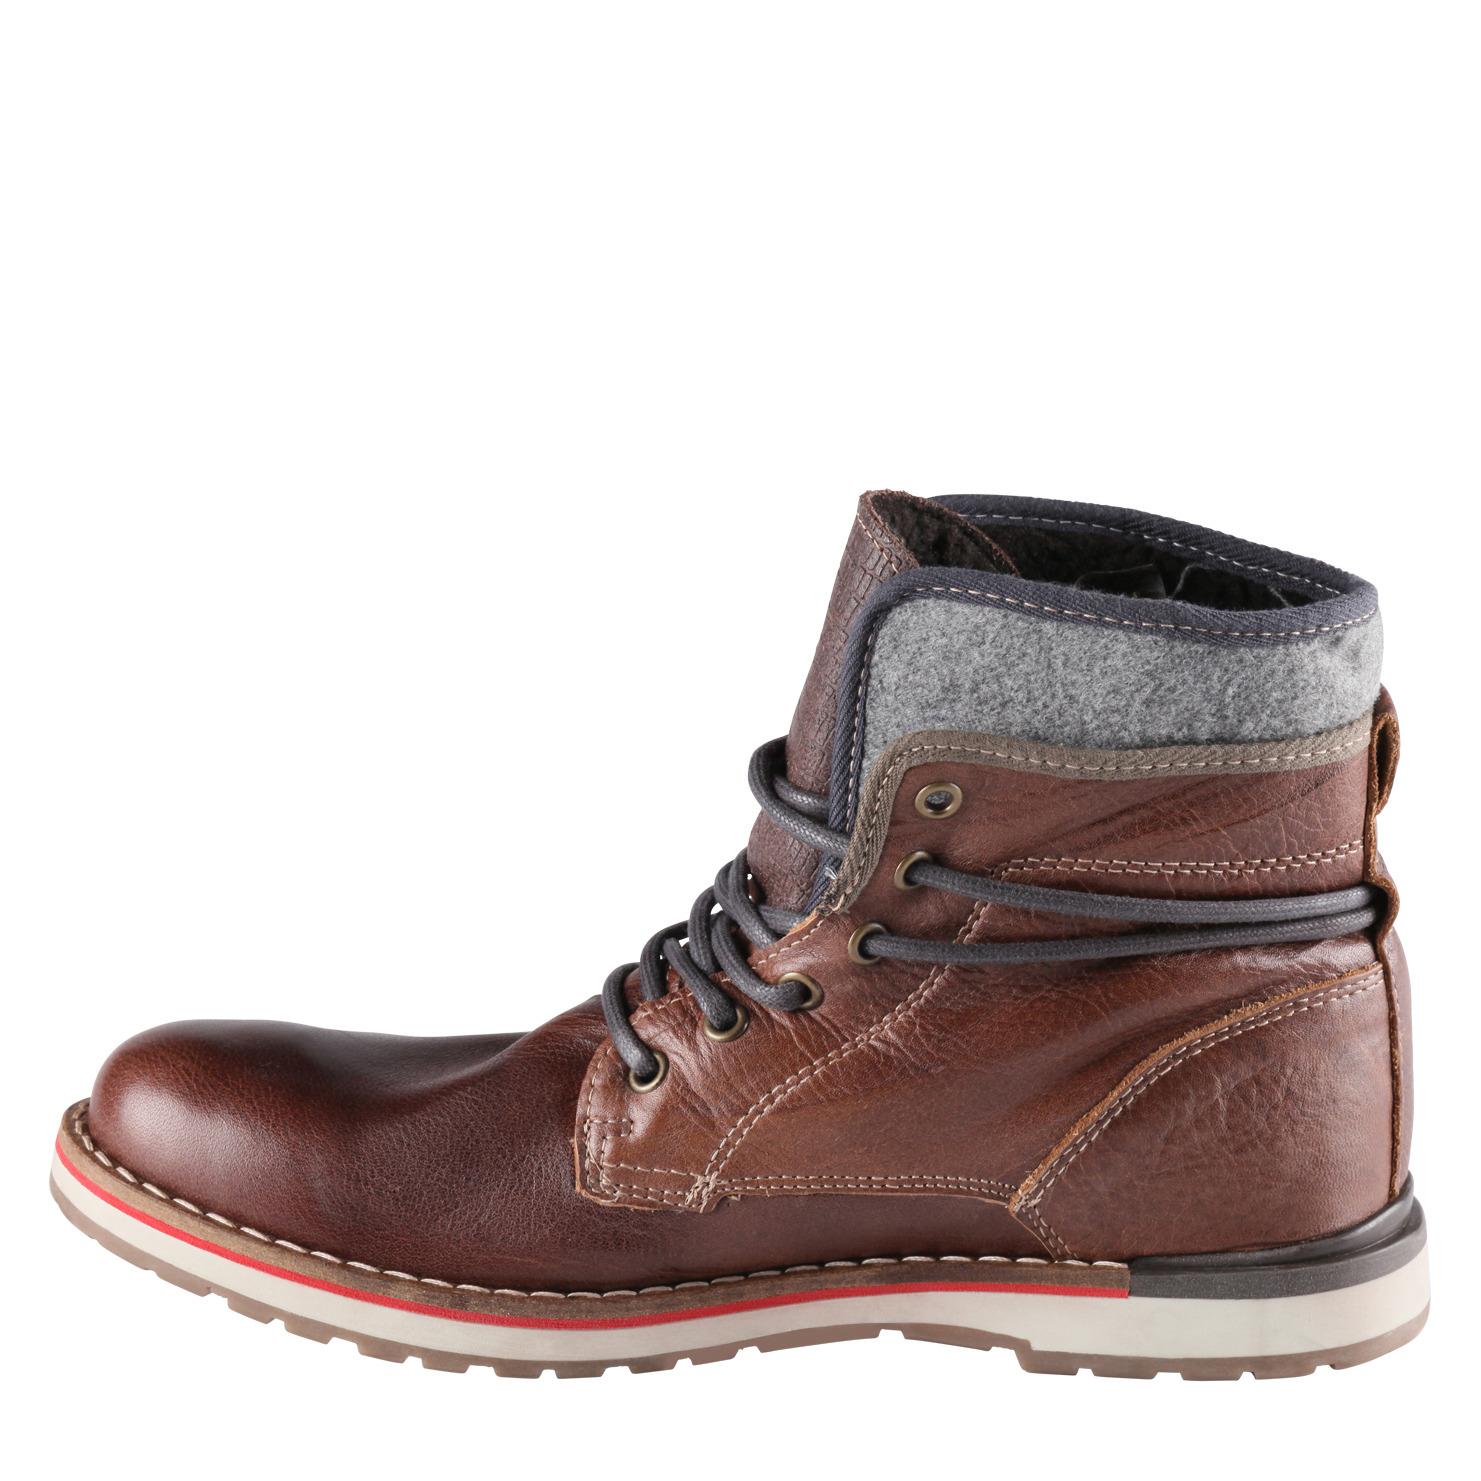 0de5e54782dda5 Brooks Glycerin 14 Womens BlackViridian GreenSilver N610900IR Shoes